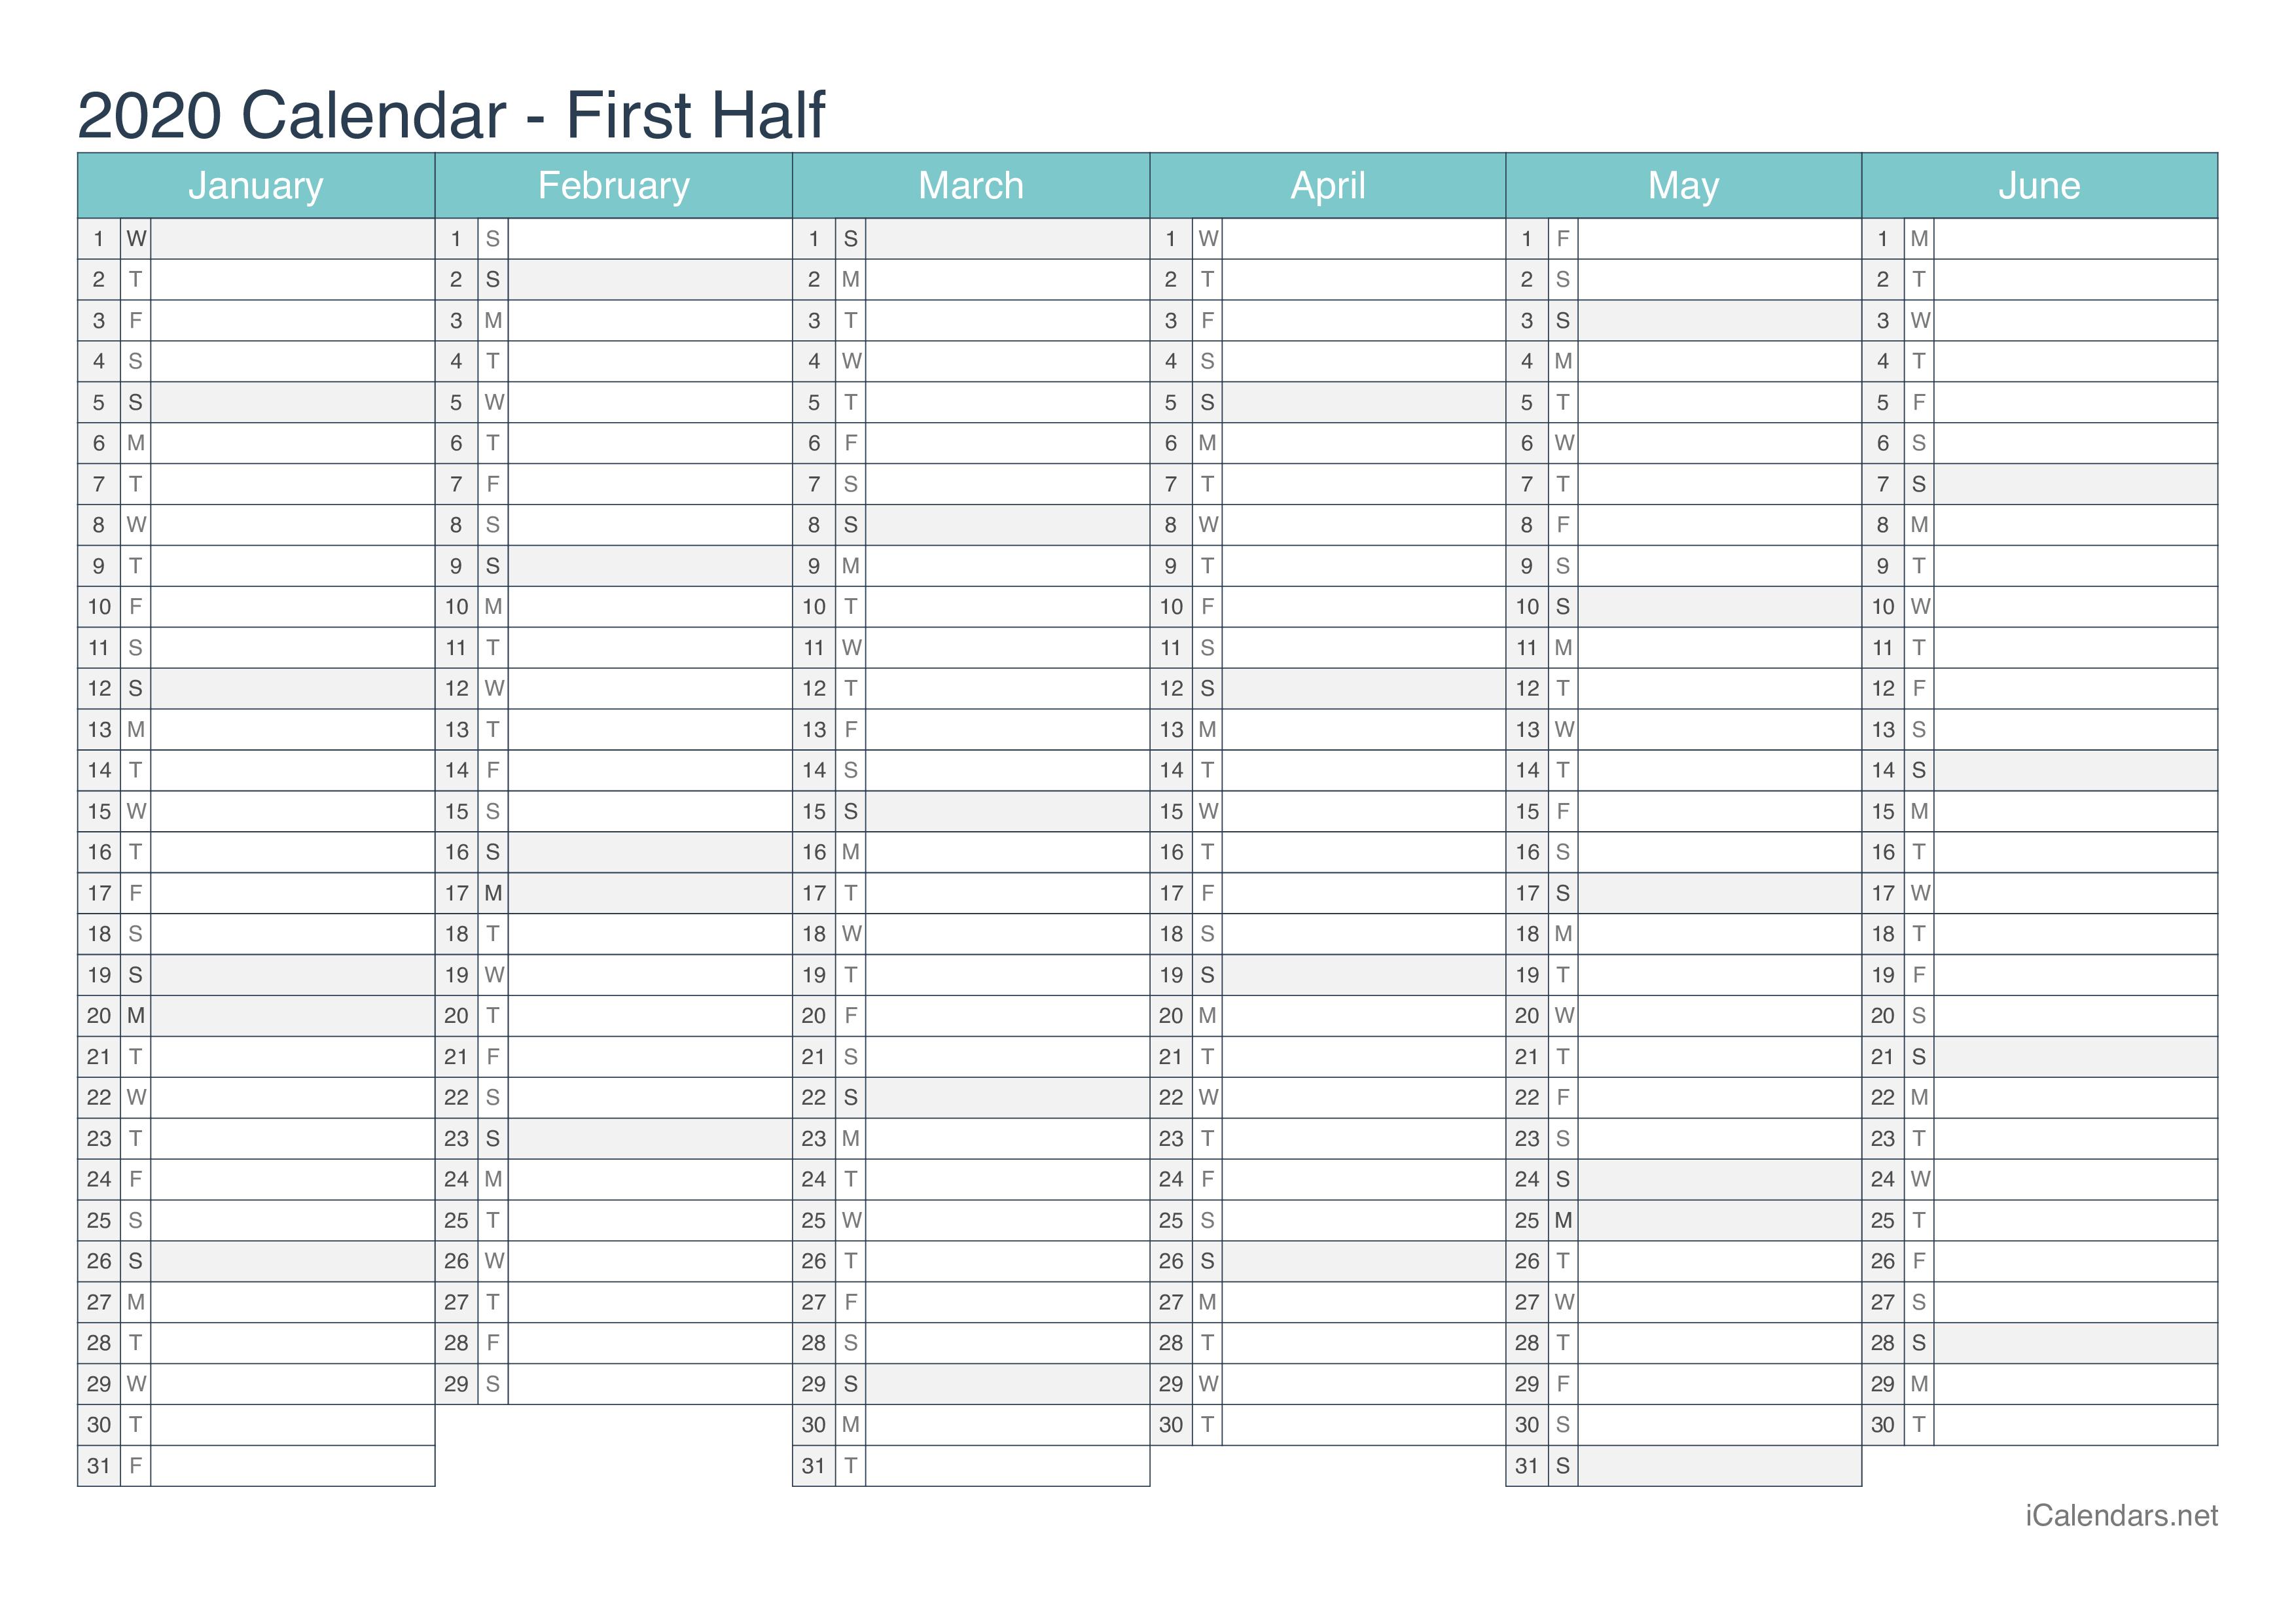 2020 Printable Calendar - Pdf Or Excel - Icalendars